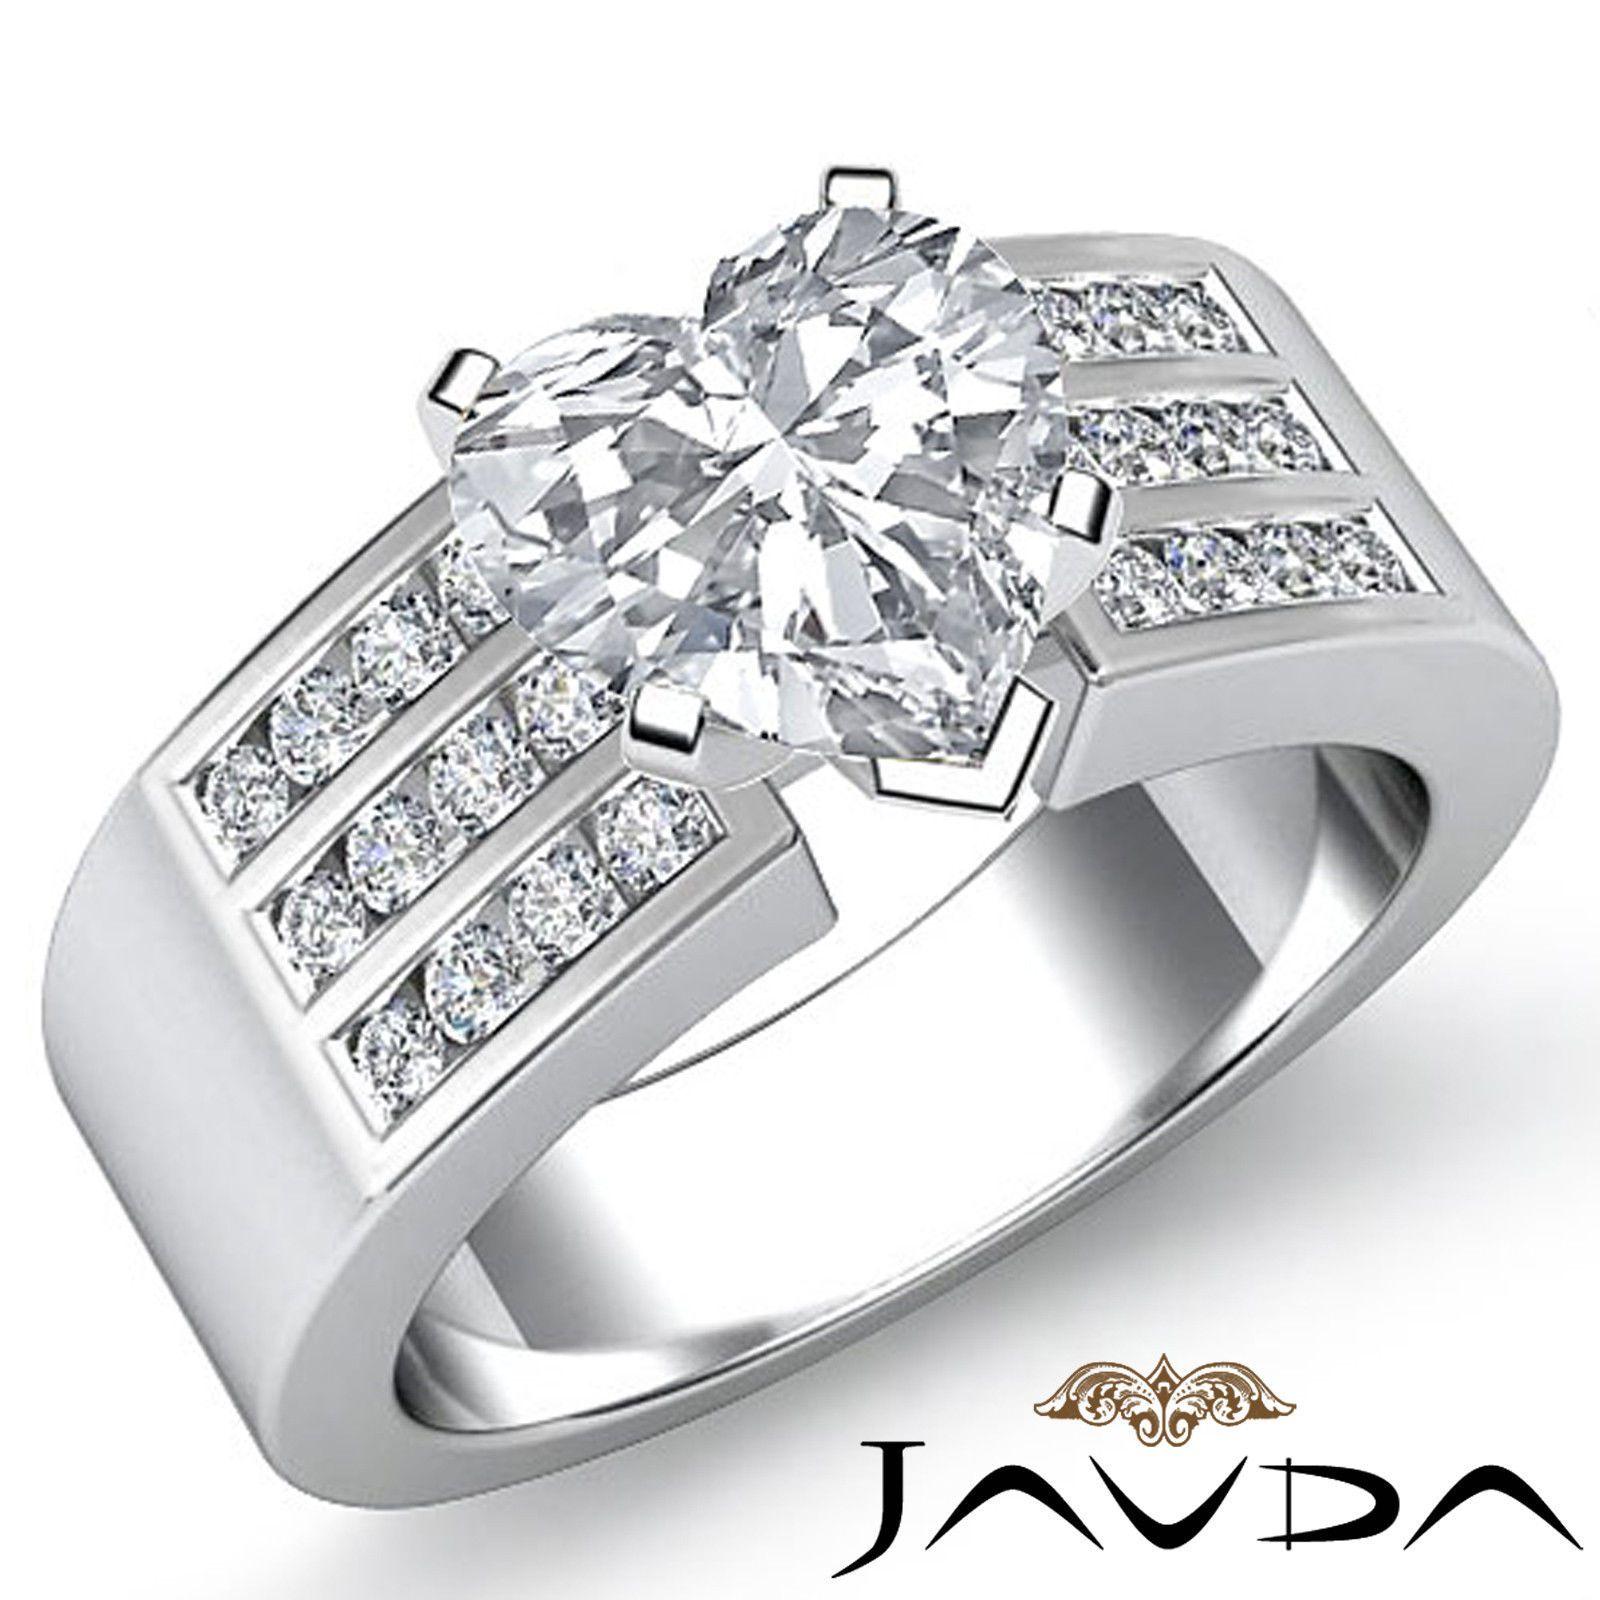 Real Heart Diamond Channel Set Shining Engagement Ring EGL E VS2 Platinum 1 31ct | eBay